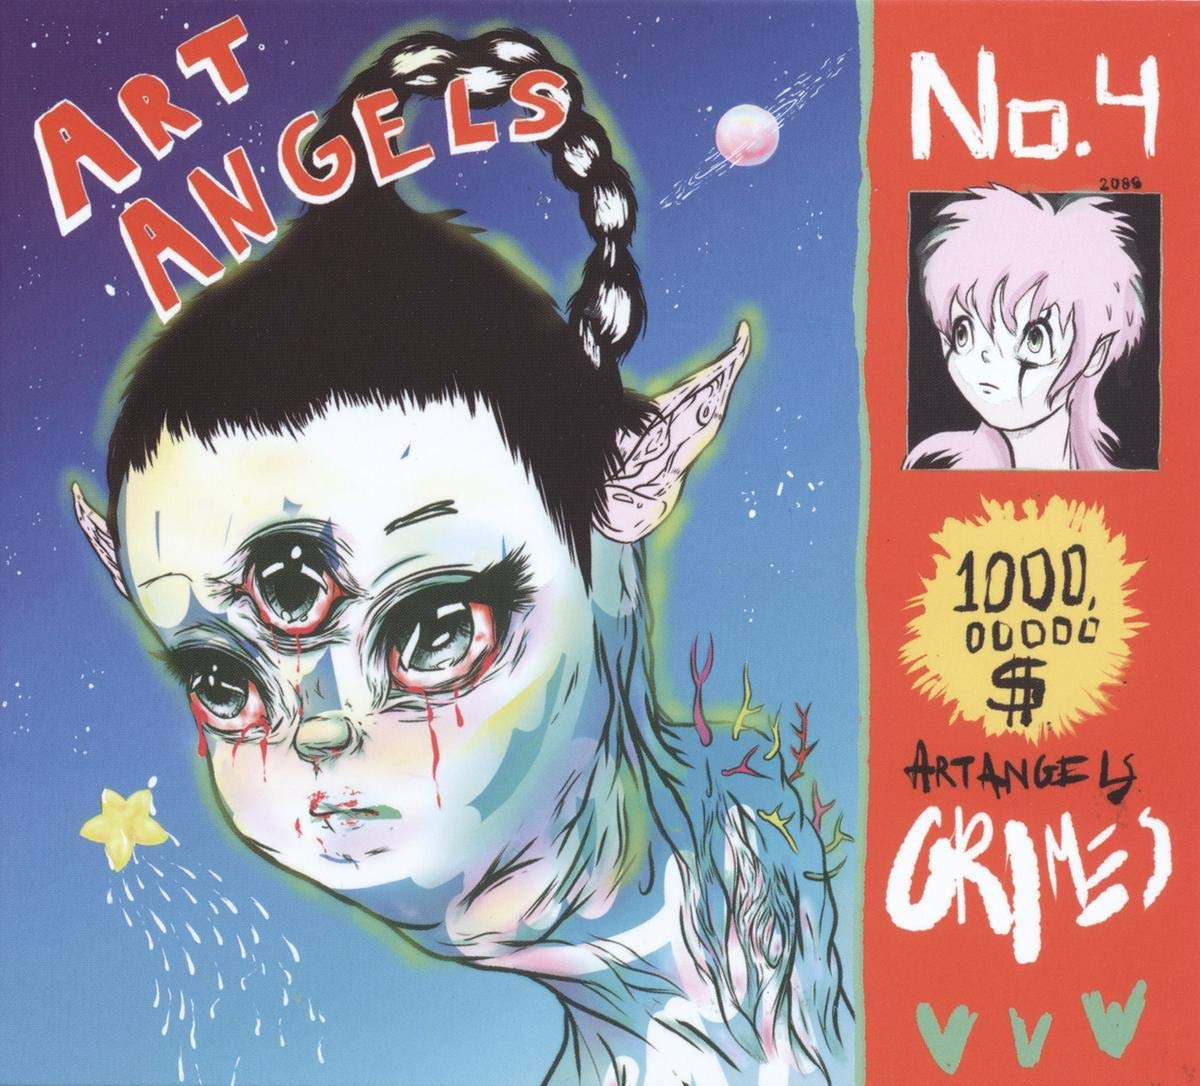 GRIMES - Art Angels - Amazon.com Music